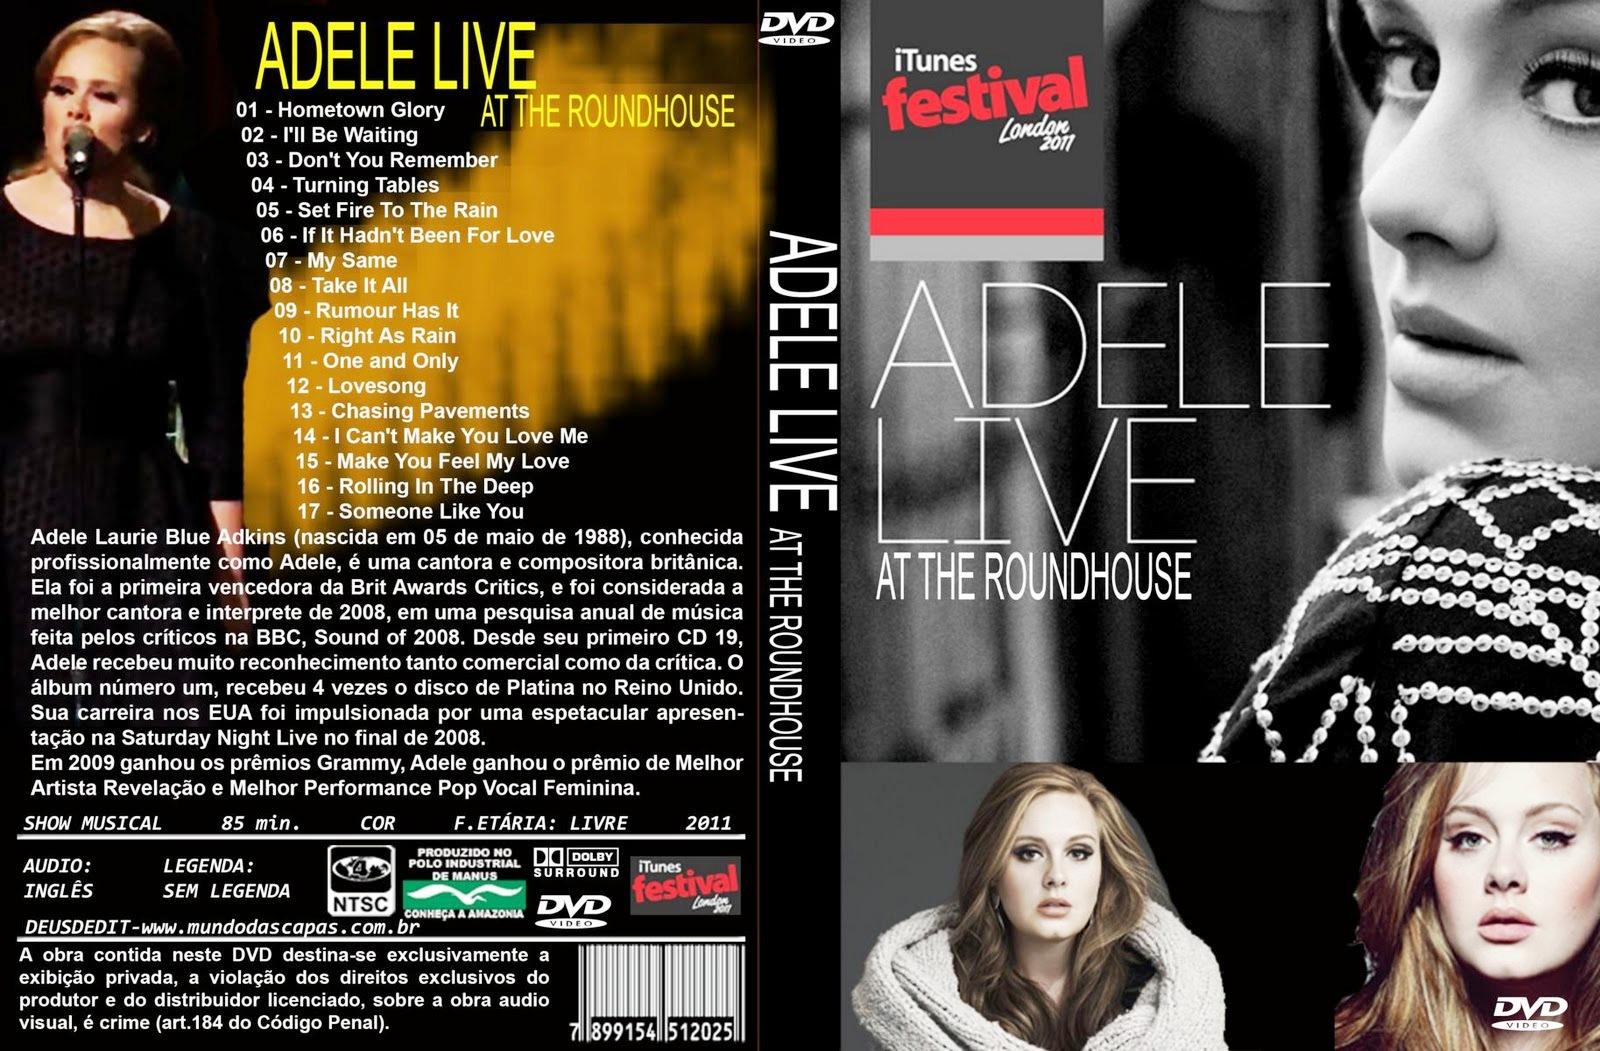 http://1.bp.blogspot.com/-xeDkHZ7f4tQ/Trx5JwdBCII/AAAAAAAAKMU/2SR5JFY-IZ8/s1600/ADELE+-+Live+At+The+Roundhouse.jpg